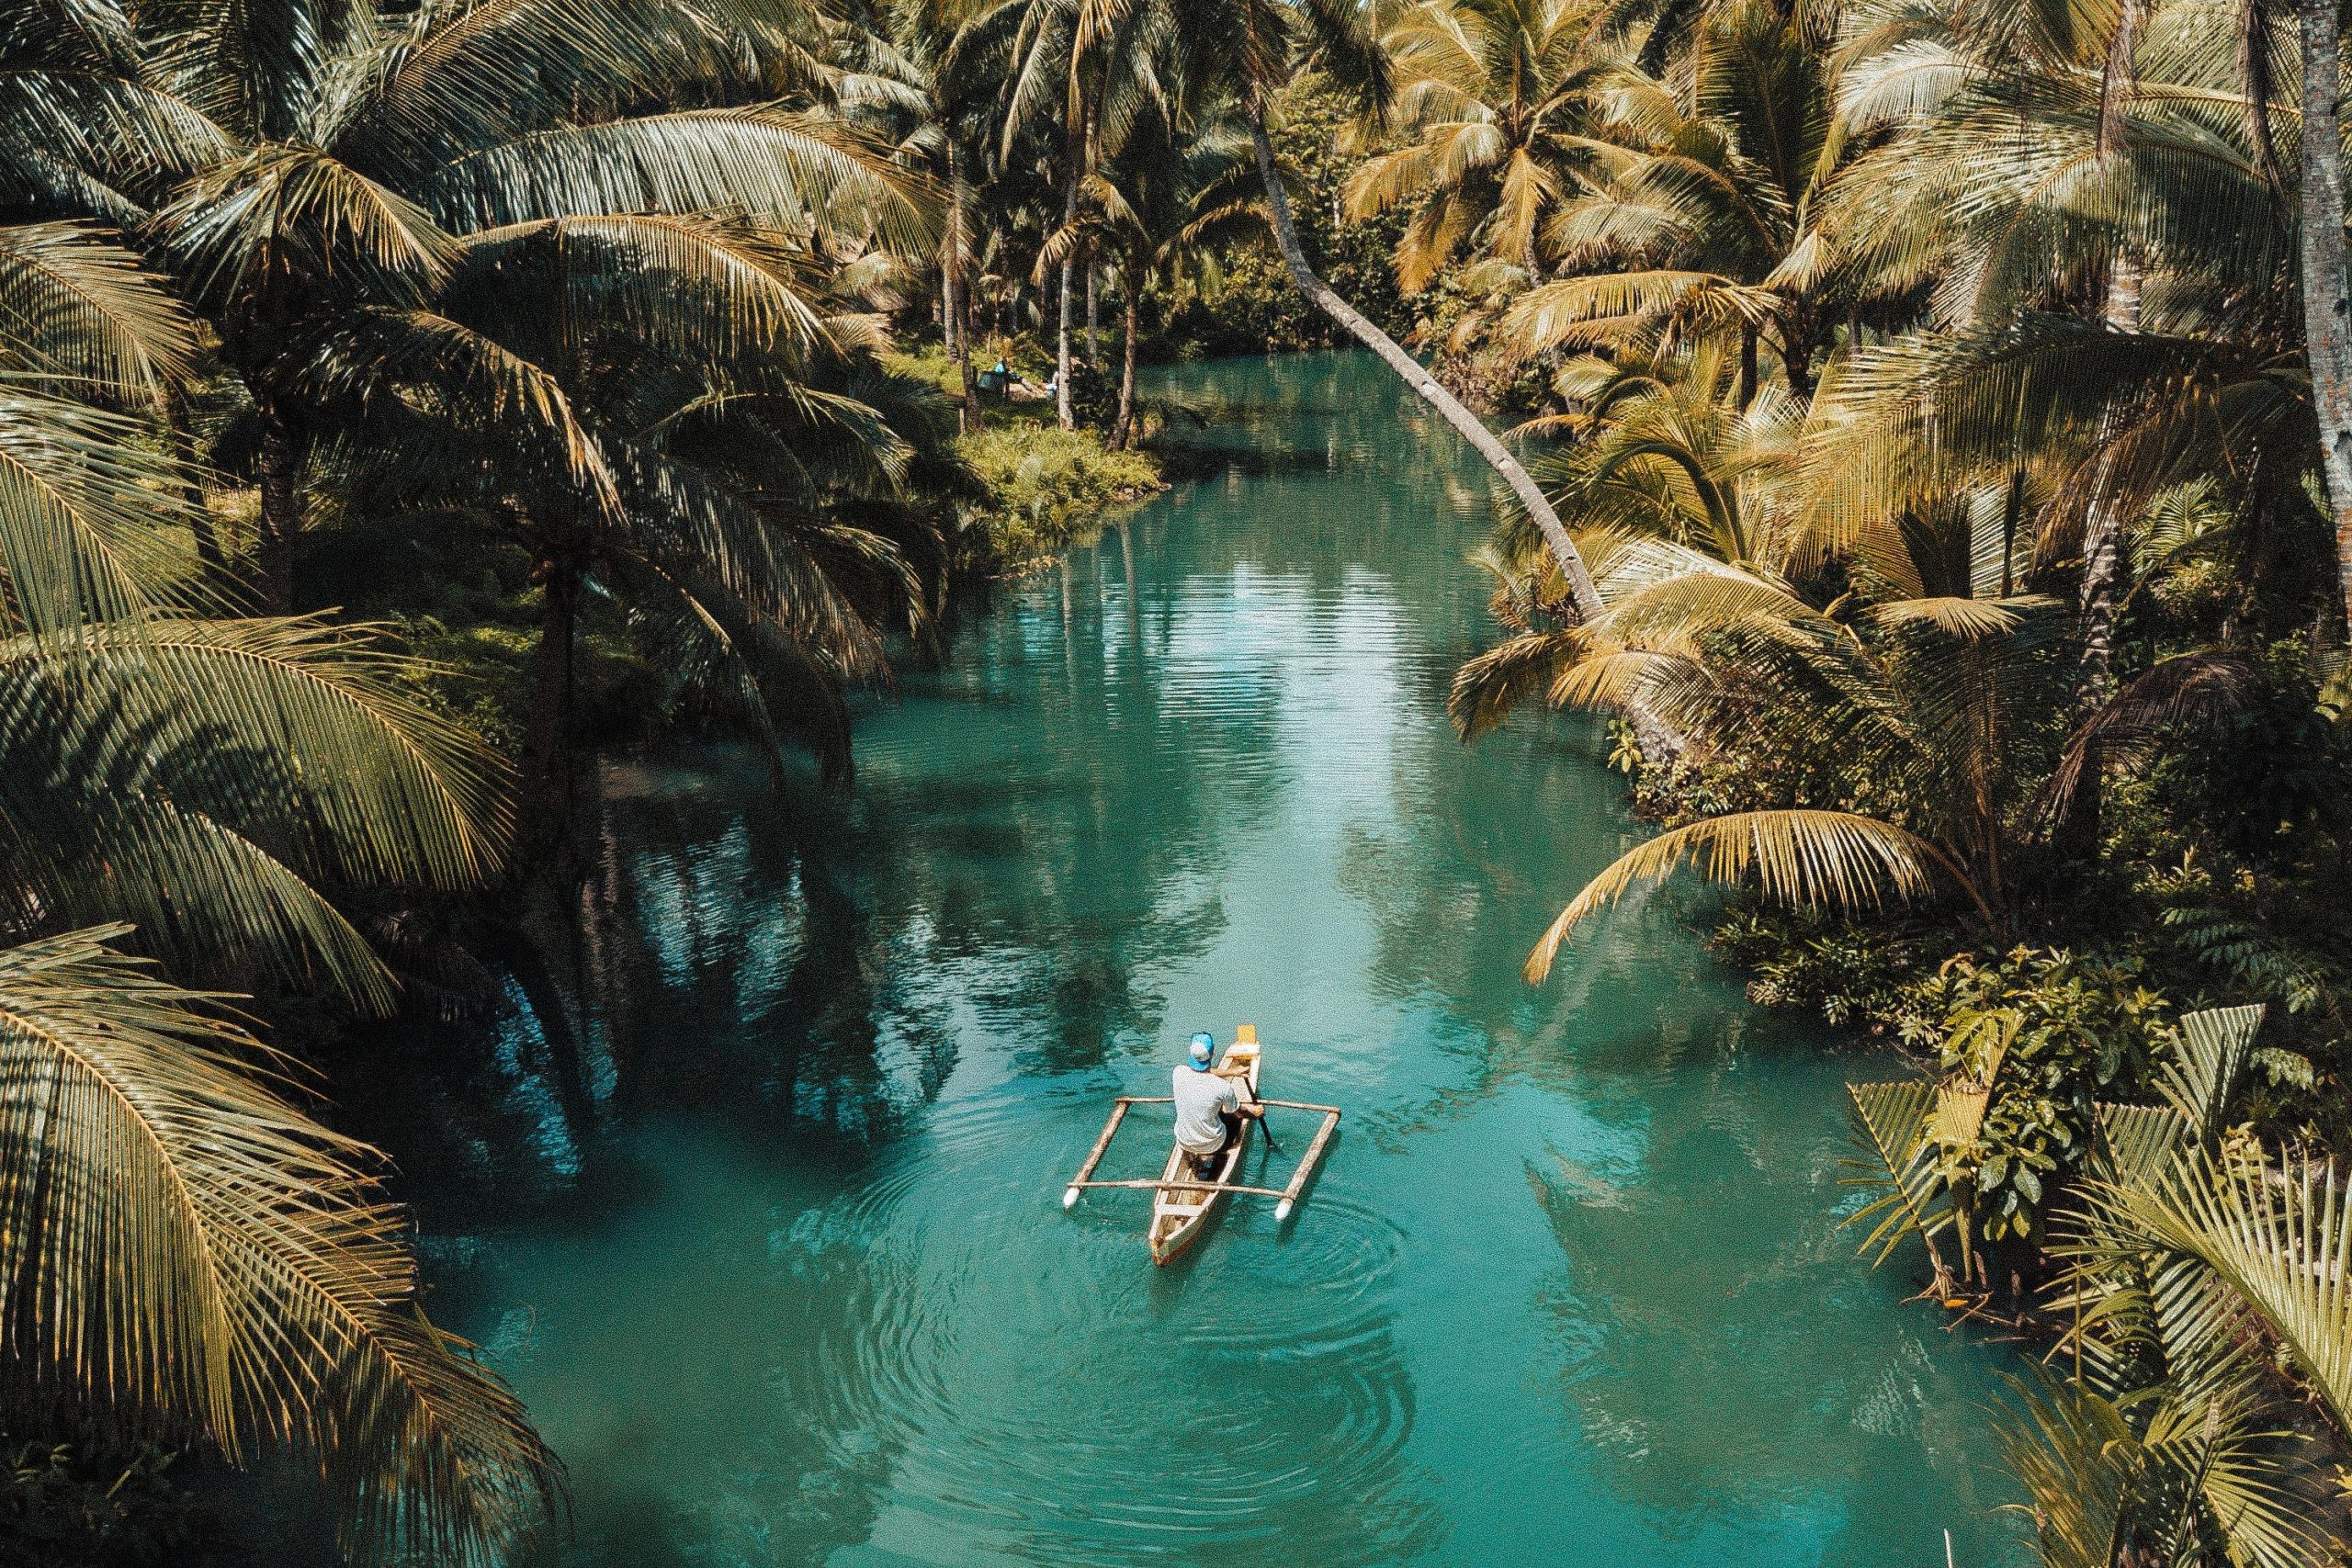 Man paddling boat through the jungle